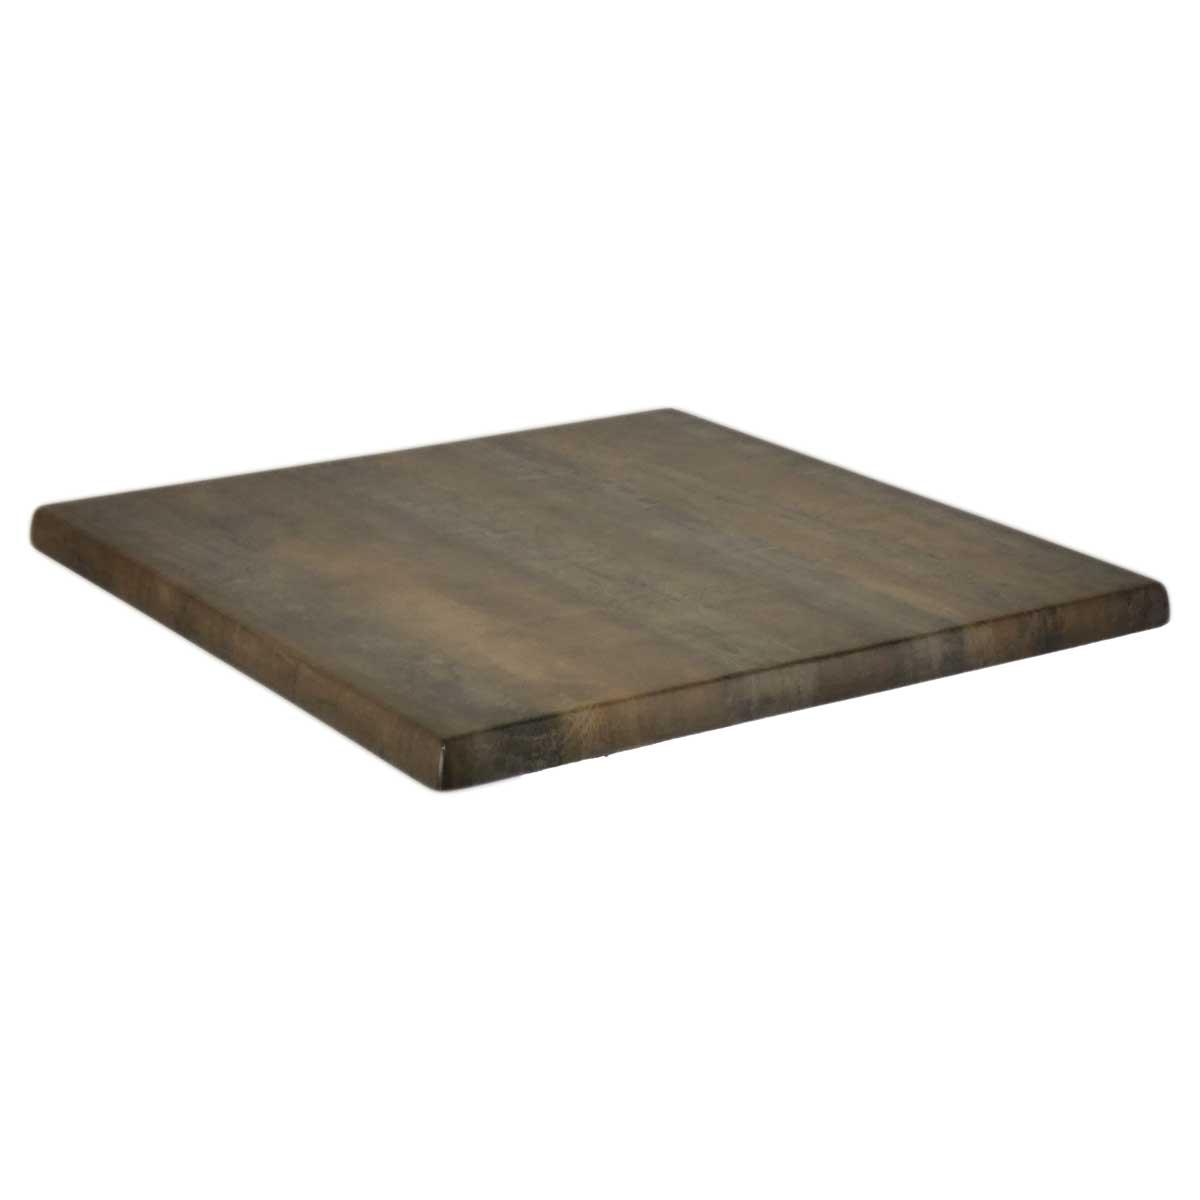 TICLA Q70 119 - https://www.werzalit.com/nl/product/tafelblad-classic-werzalit-q-90x90-119-arizona/